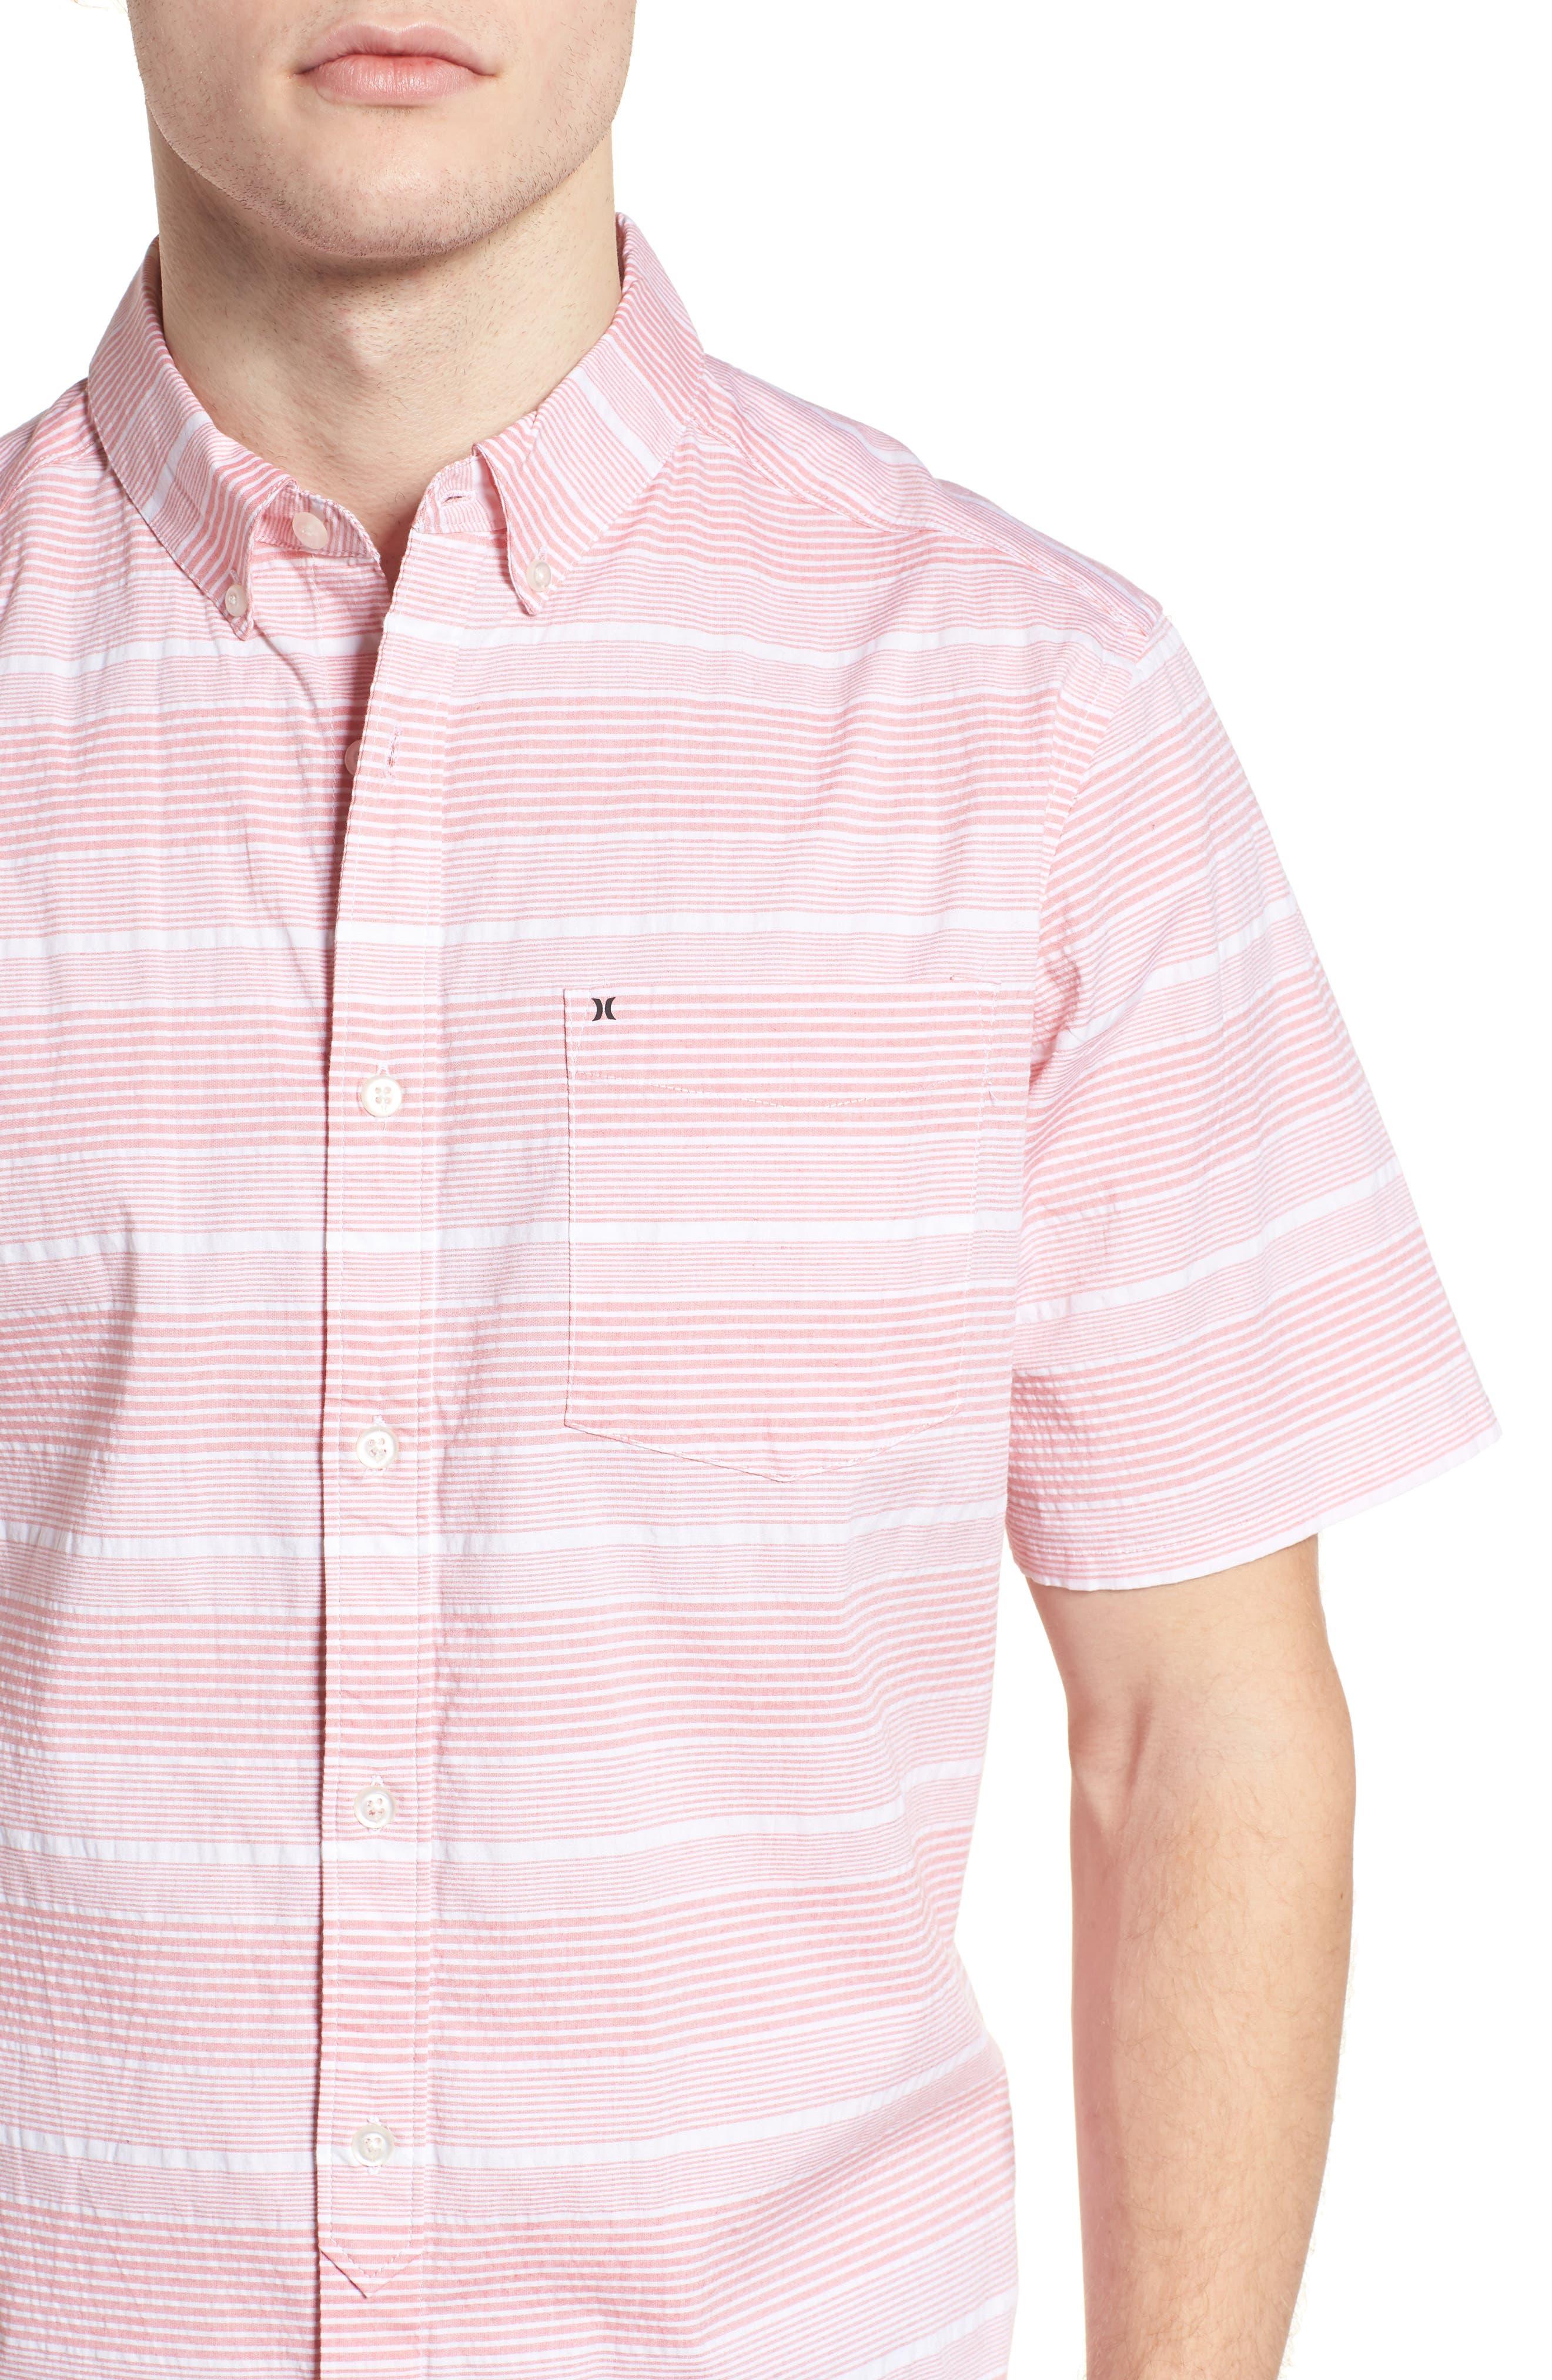 Surplus Short Sleeve Shirt,                             Alternate thumbnail 8, color,